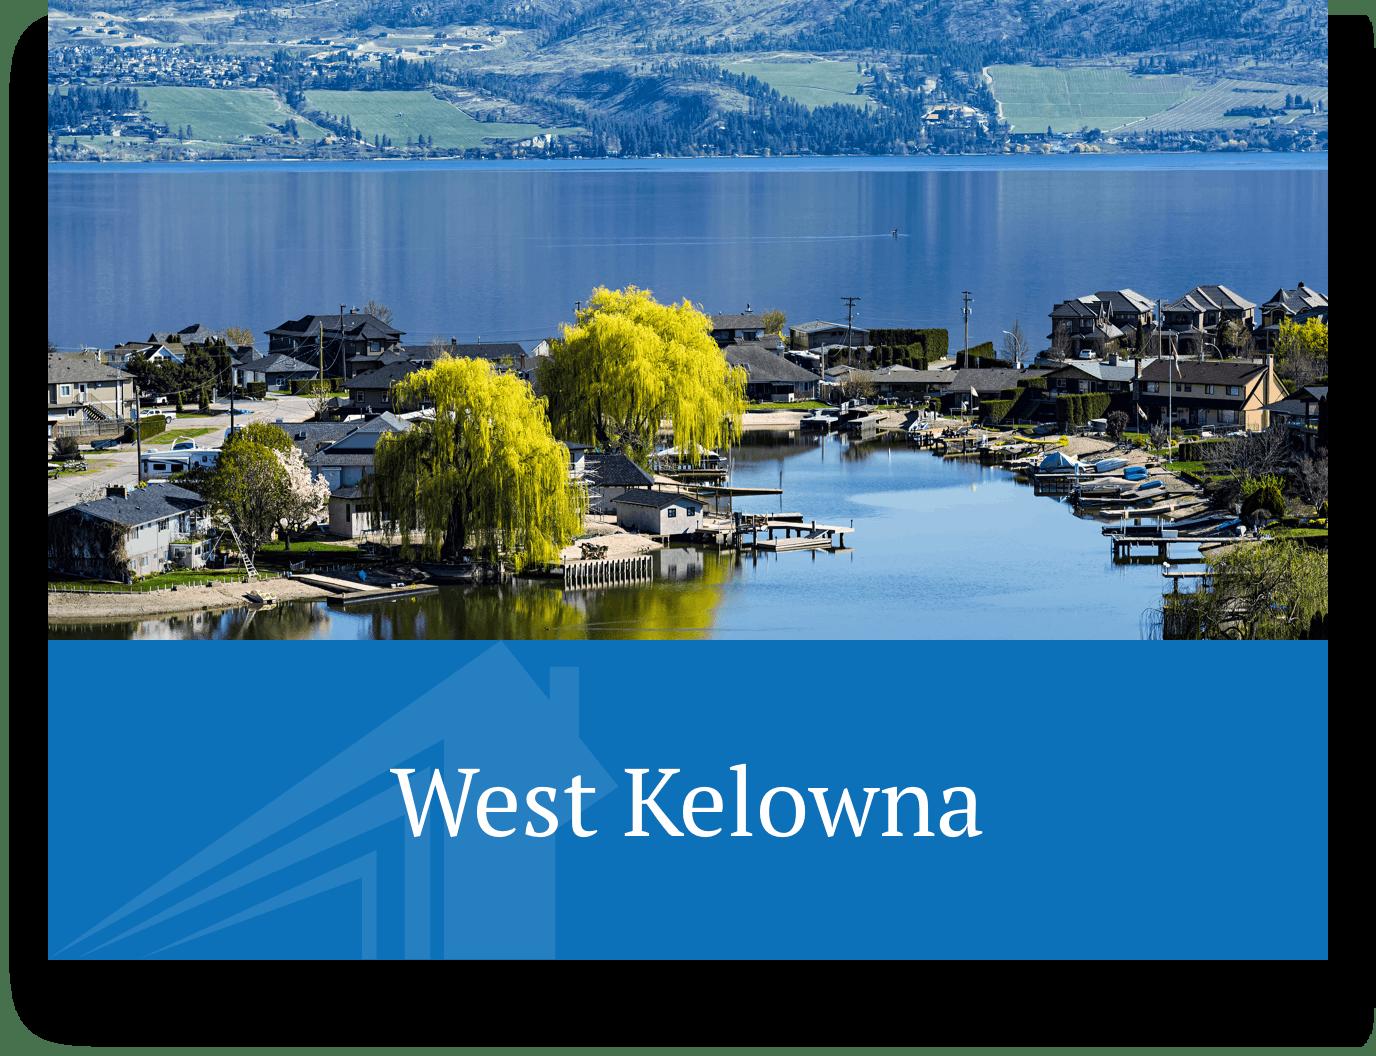 West Kelowna